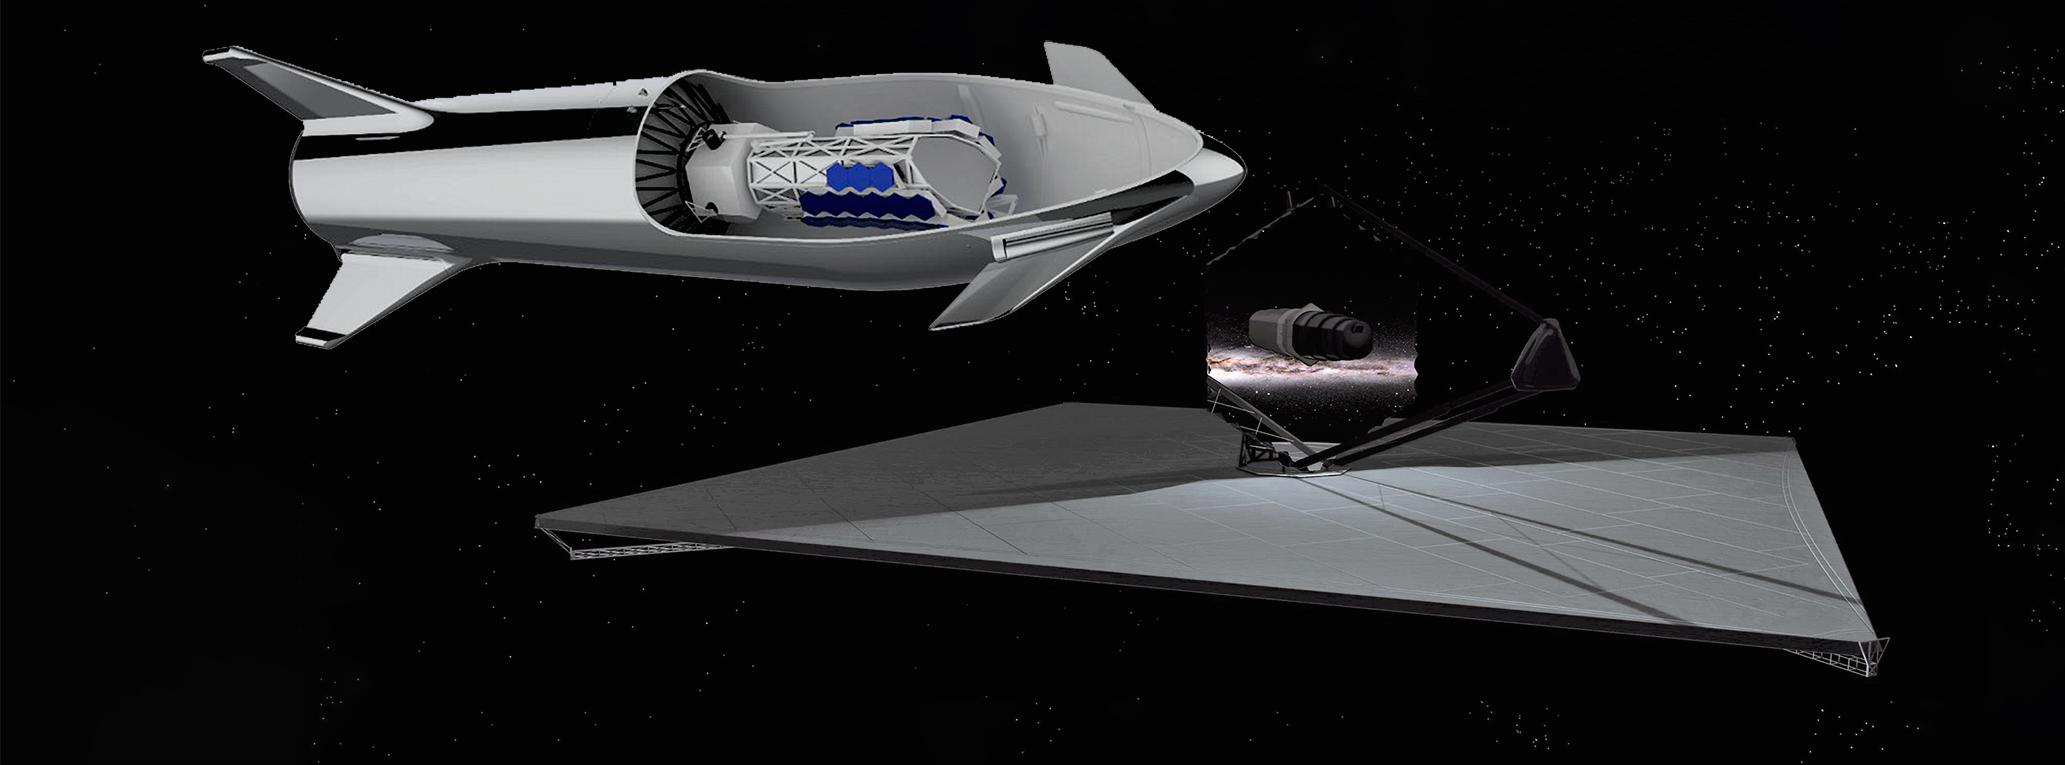 Starship NASA LUVOIR A and B space telescopes (SpaceX – NASA) 2